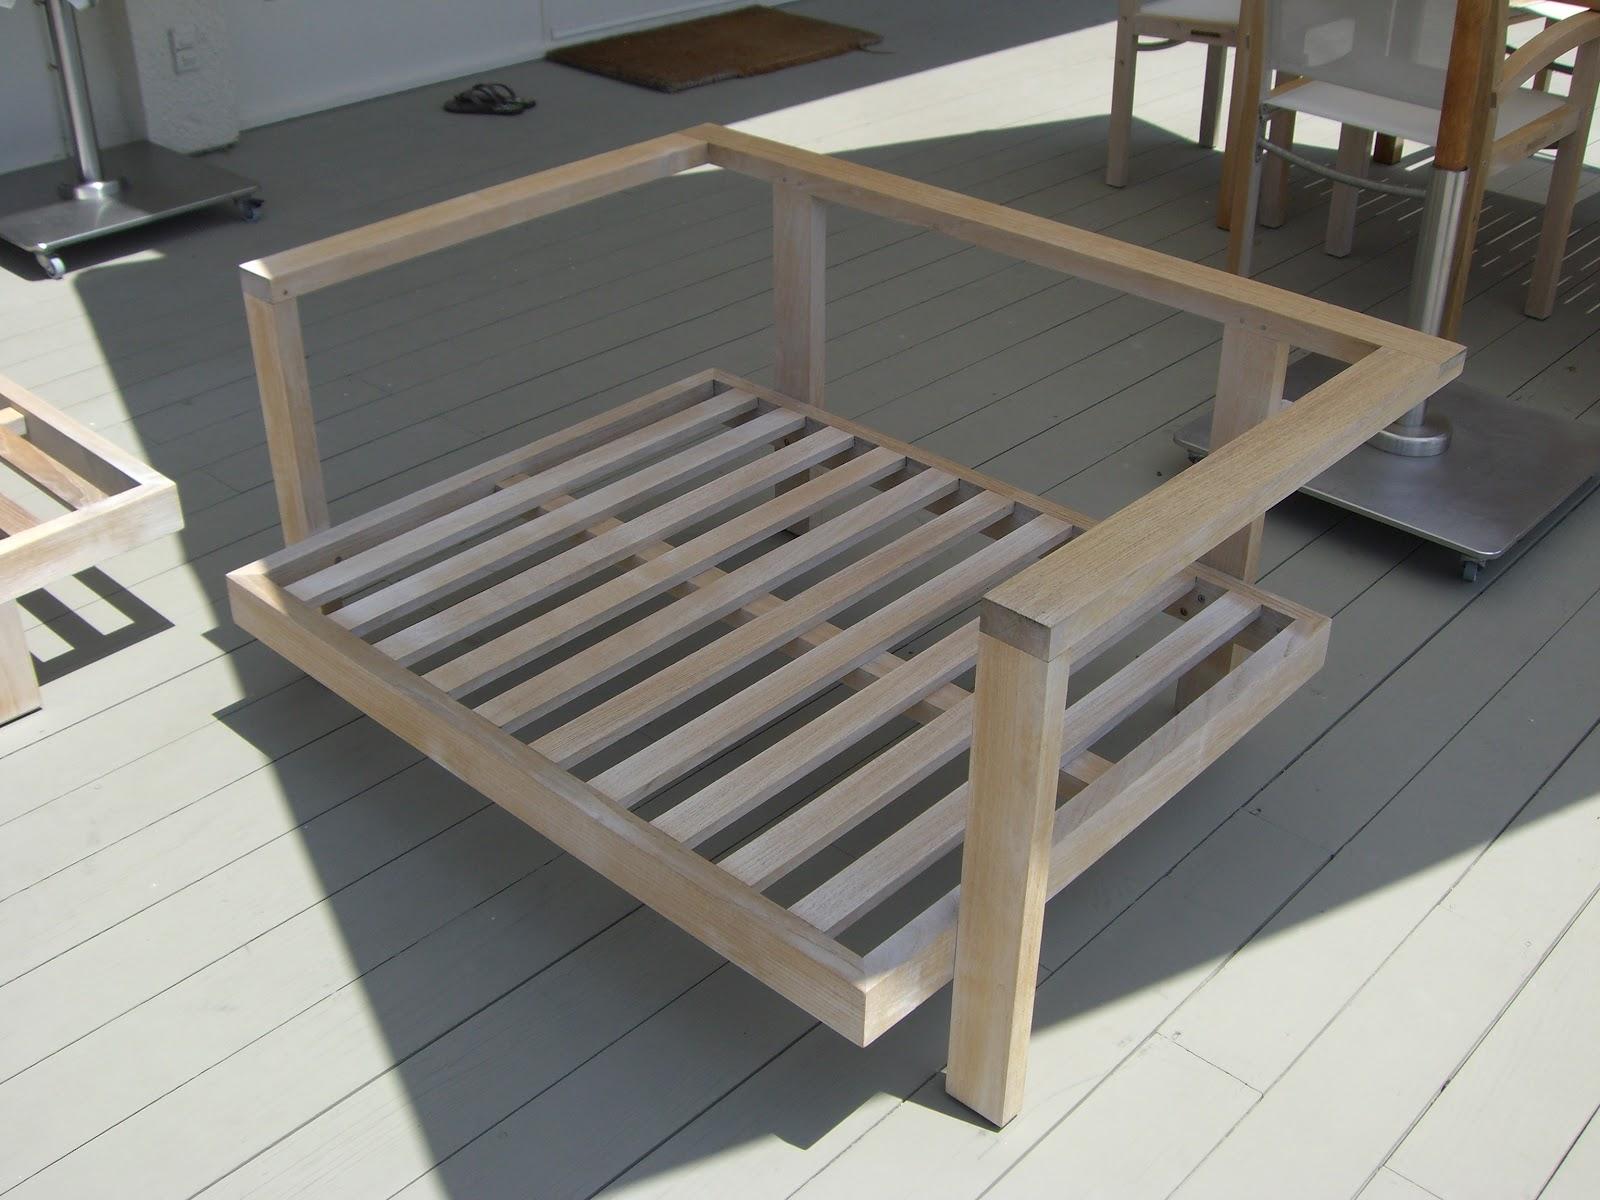 Refinishing Outdoor Wood Furniture